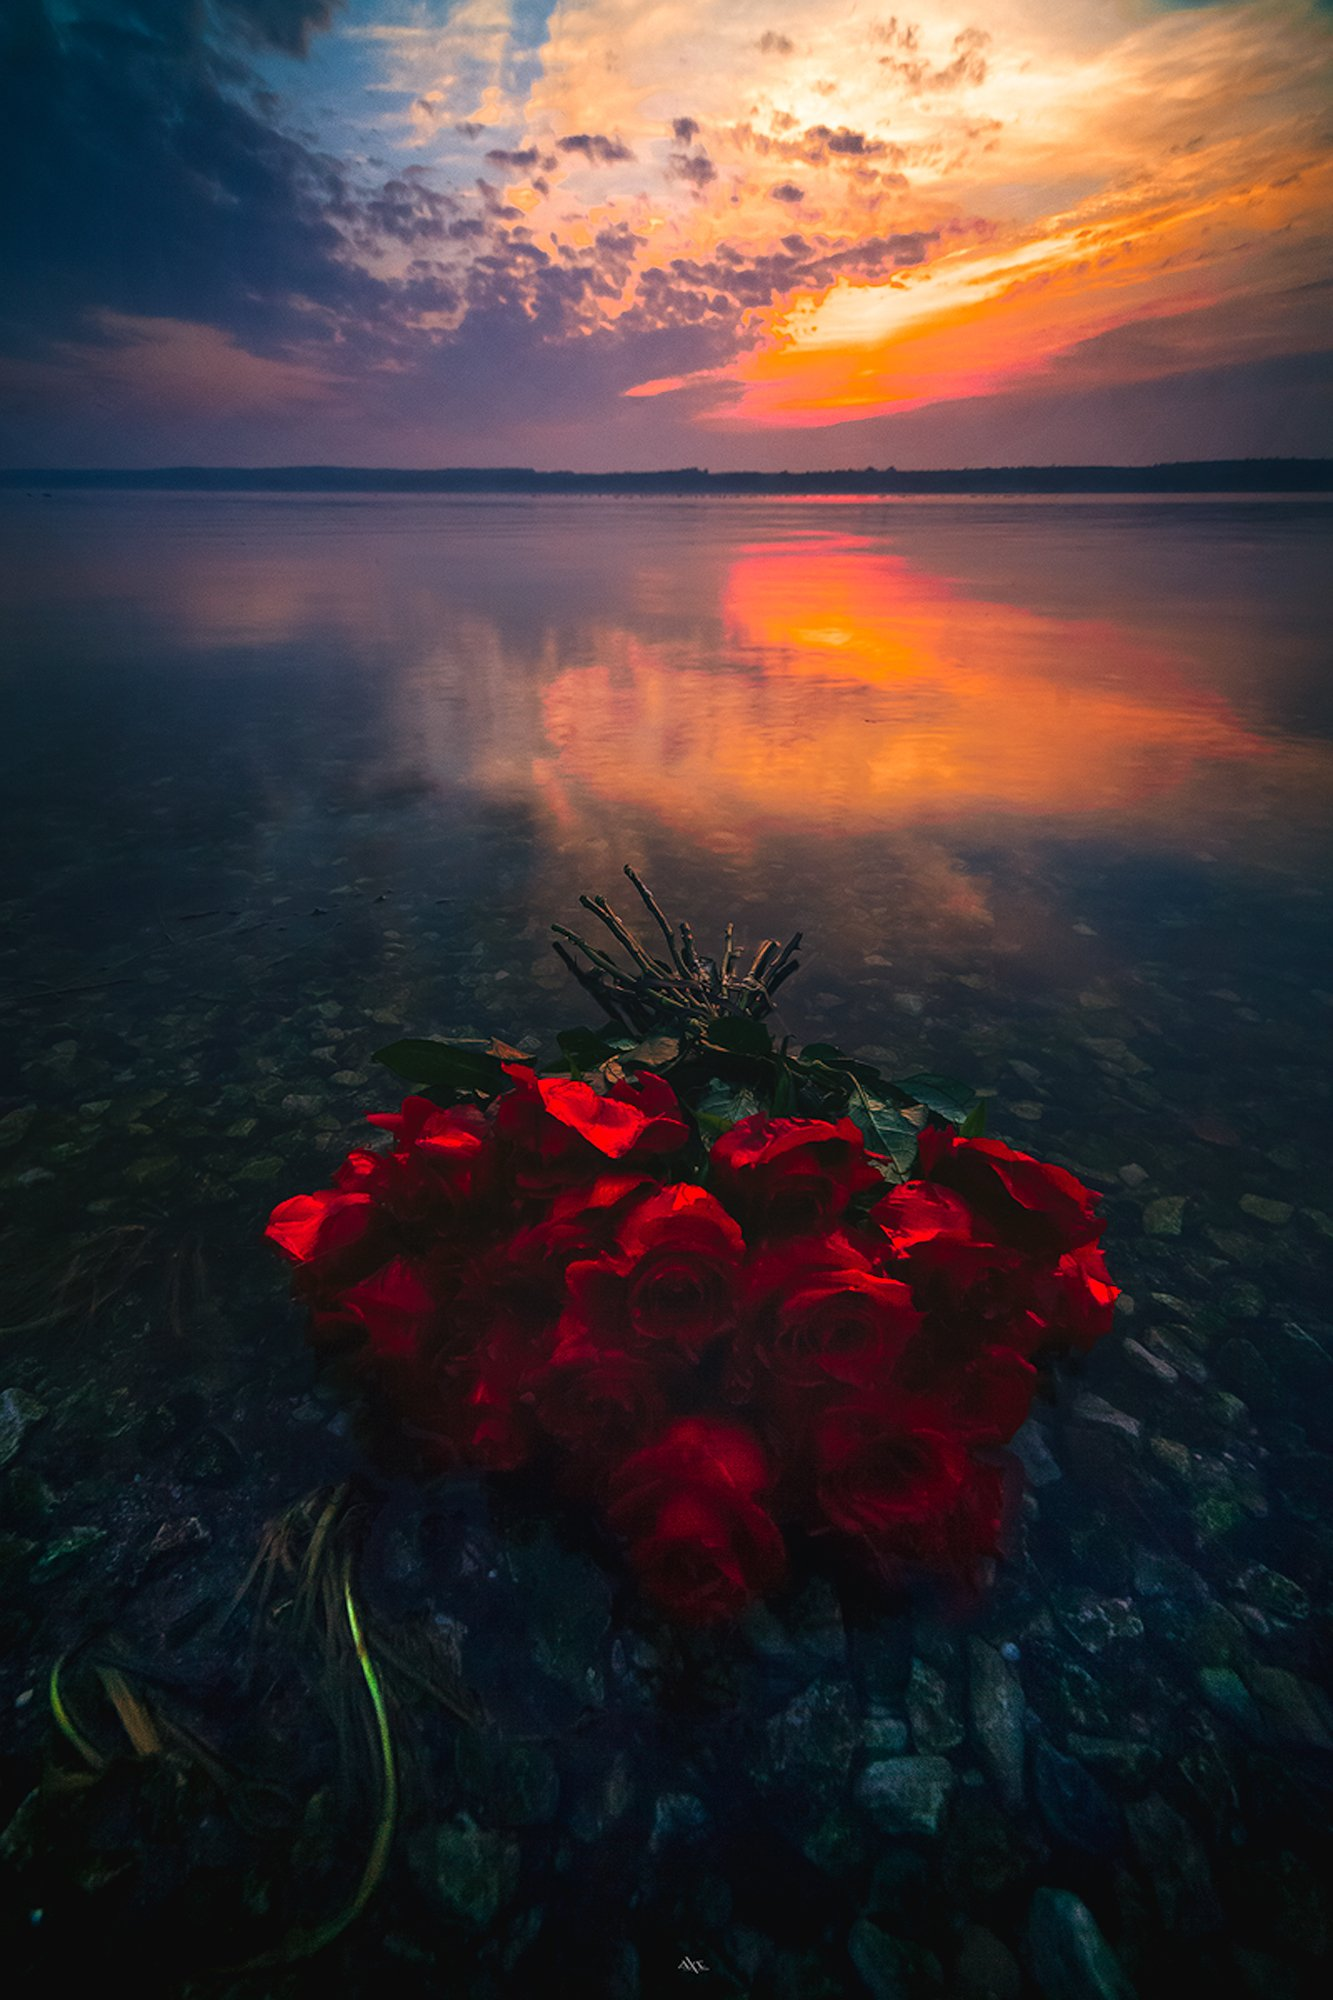 landscape, sunset, curonian lagoon, lithuania, colors, reflection, roses, Руслан Болгов (Axe)